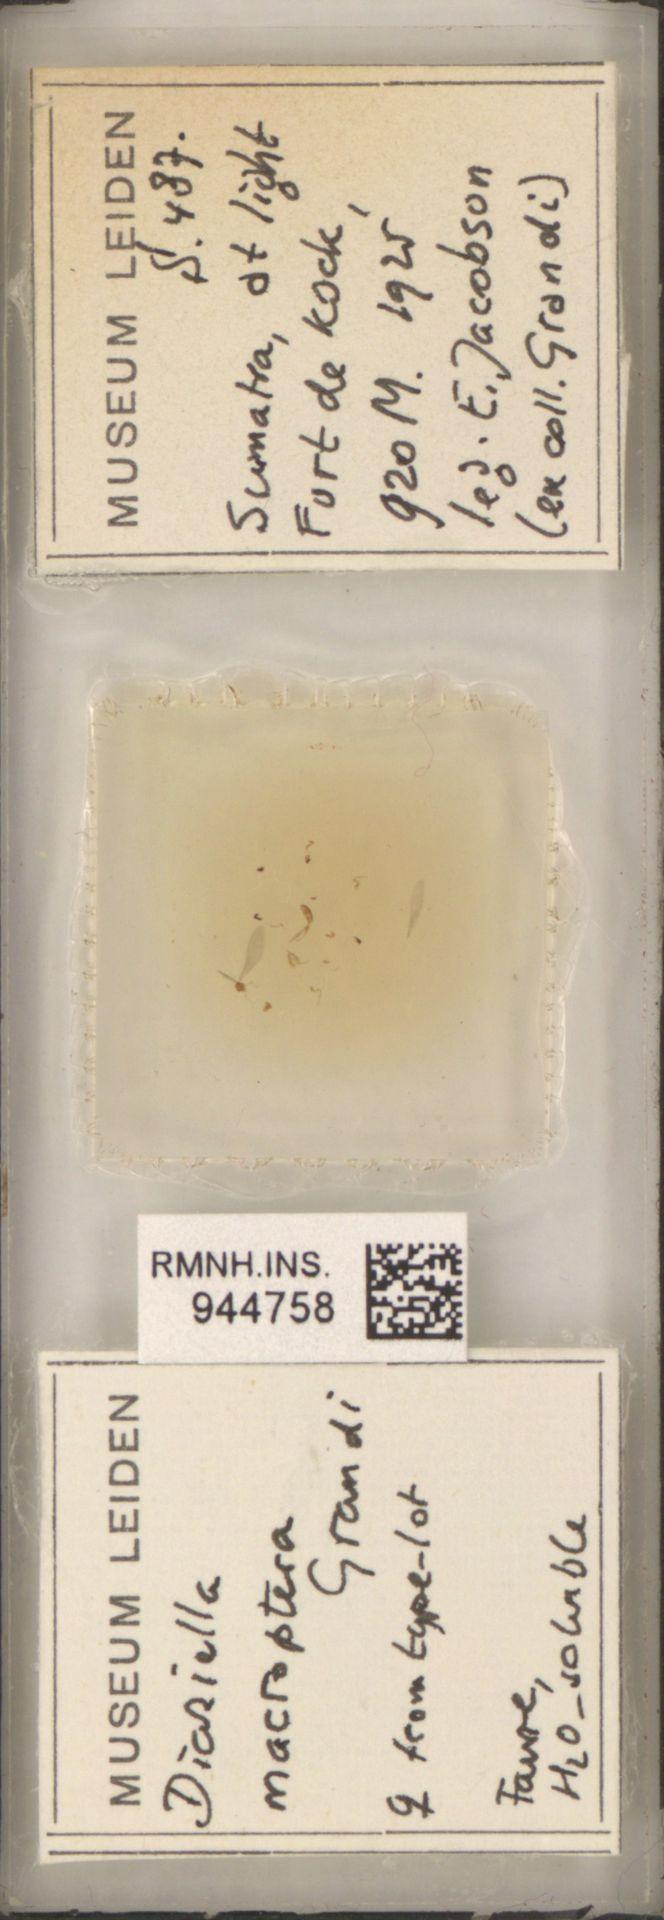 RMNH.INS.944758 | Diaziella macroptera Grandi